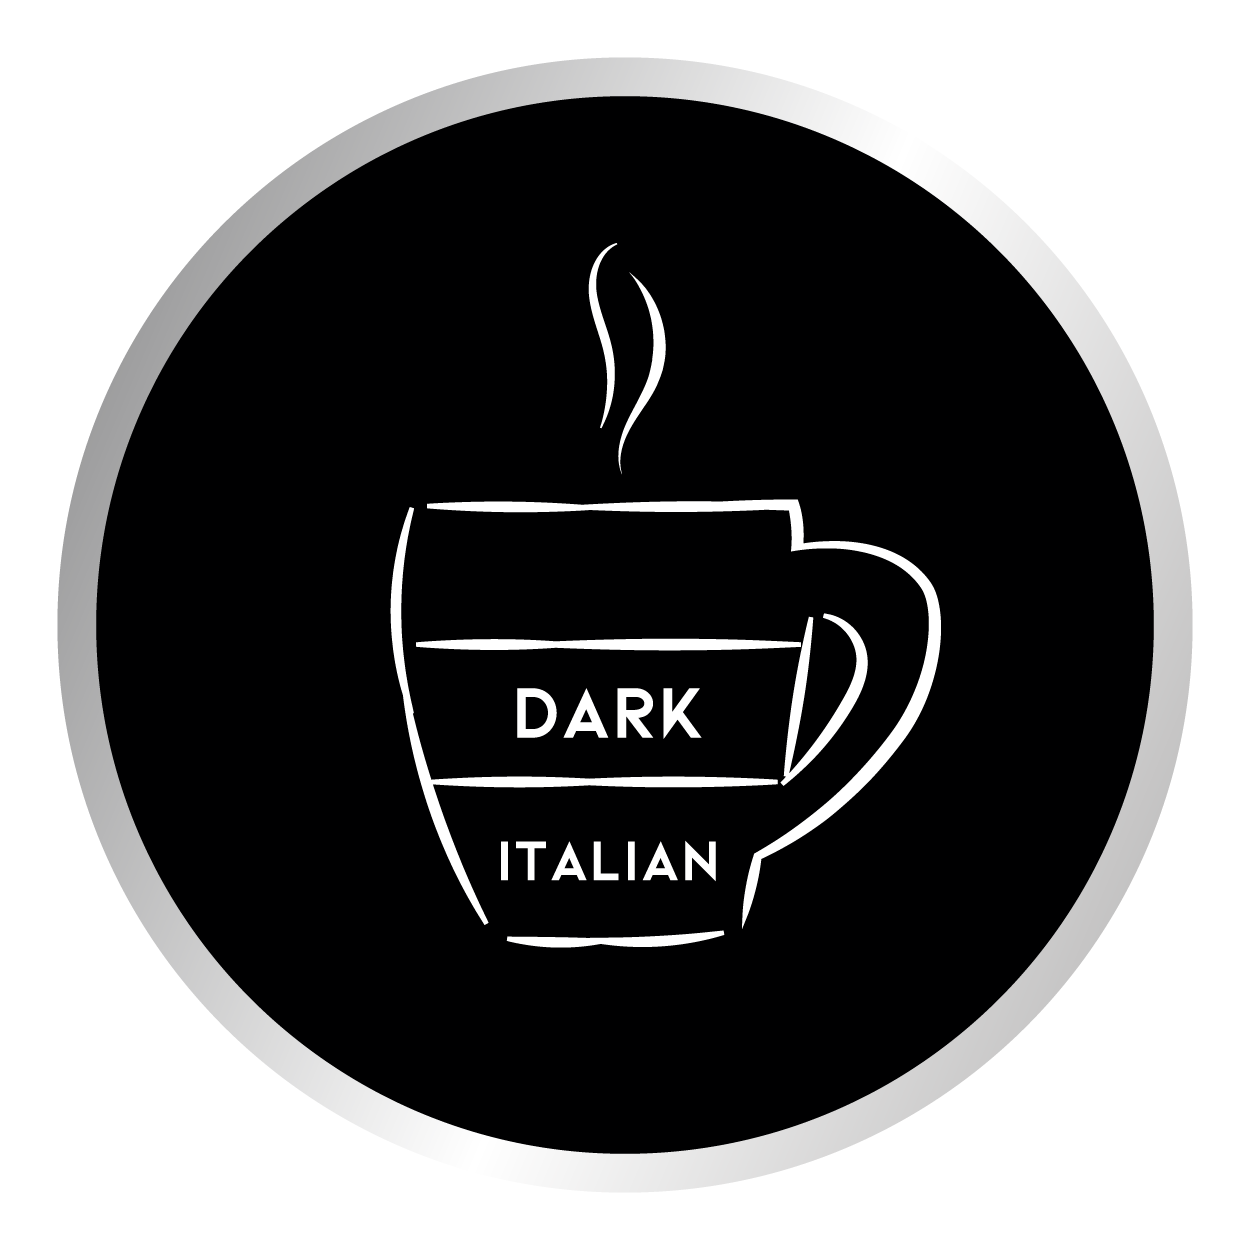 Dark Italian